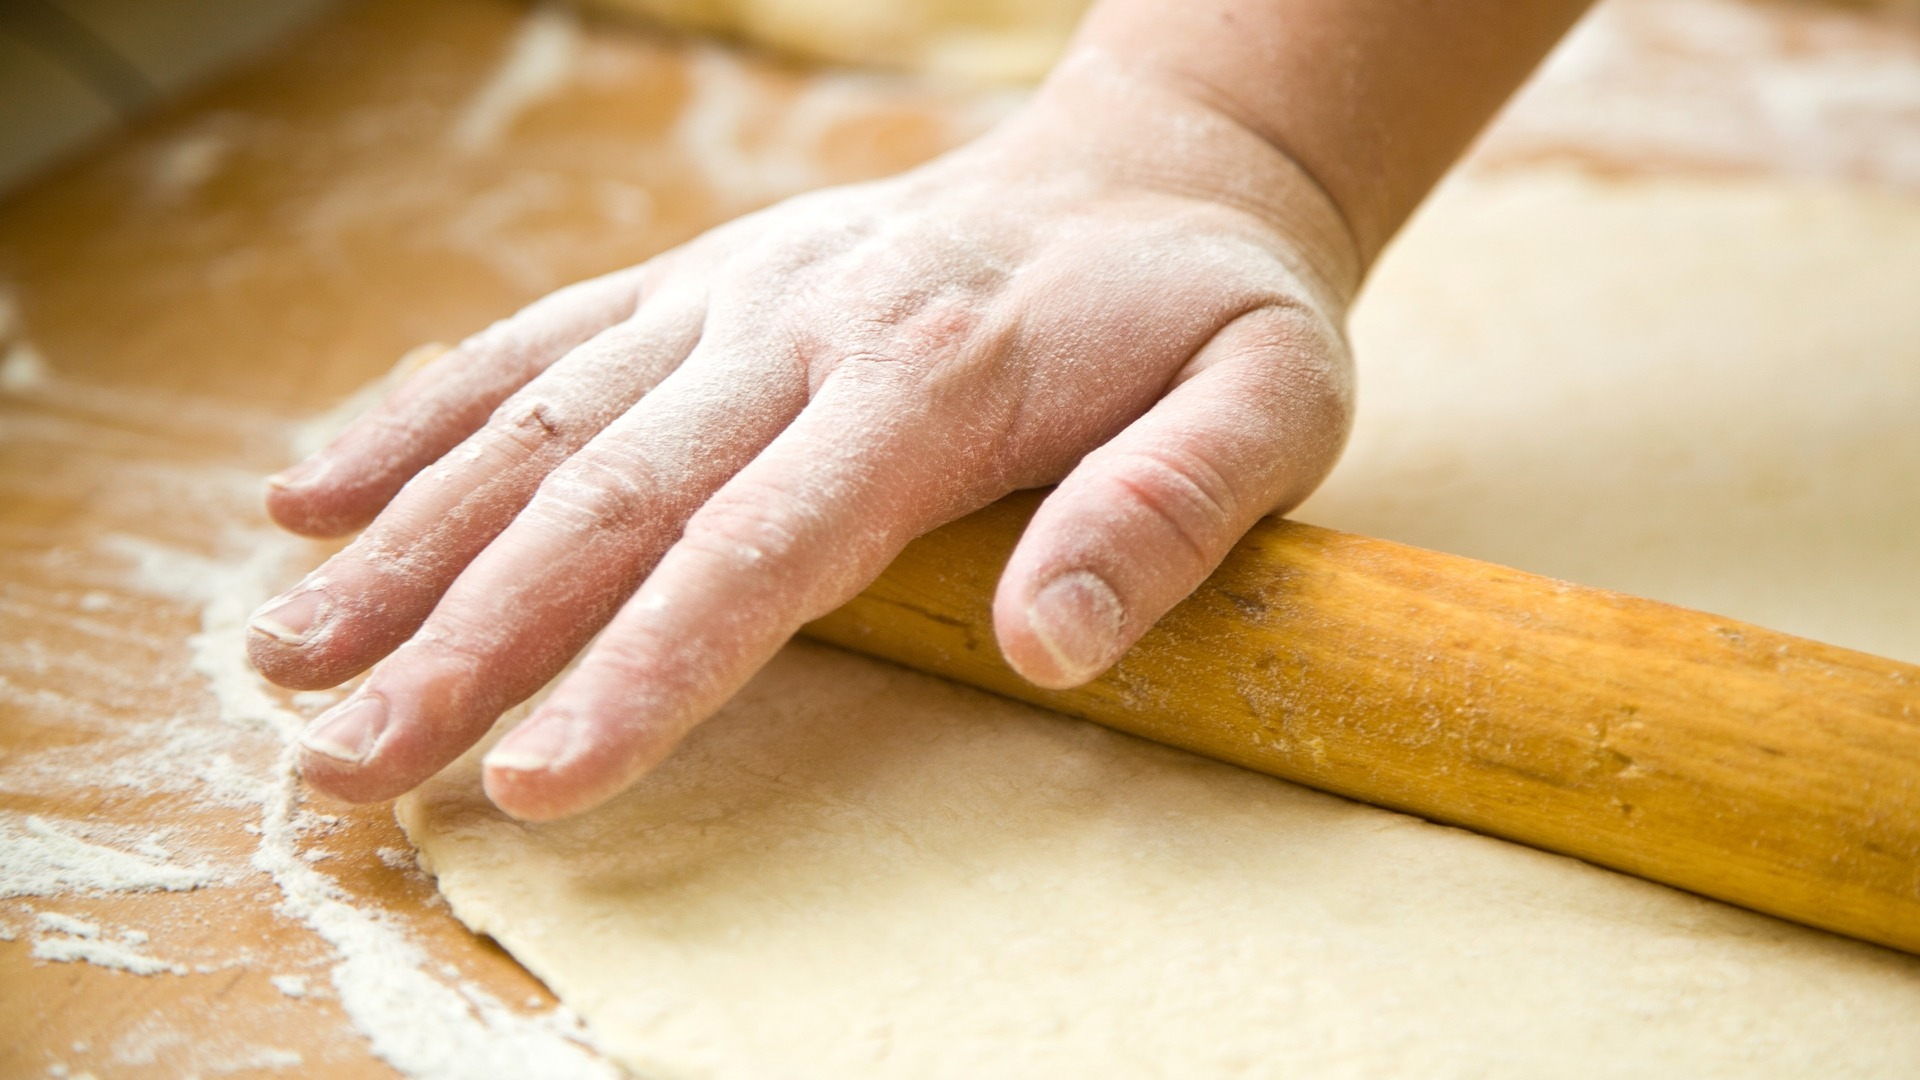 short crust, pastry crust. dough, rolling, pin, pasta, bread